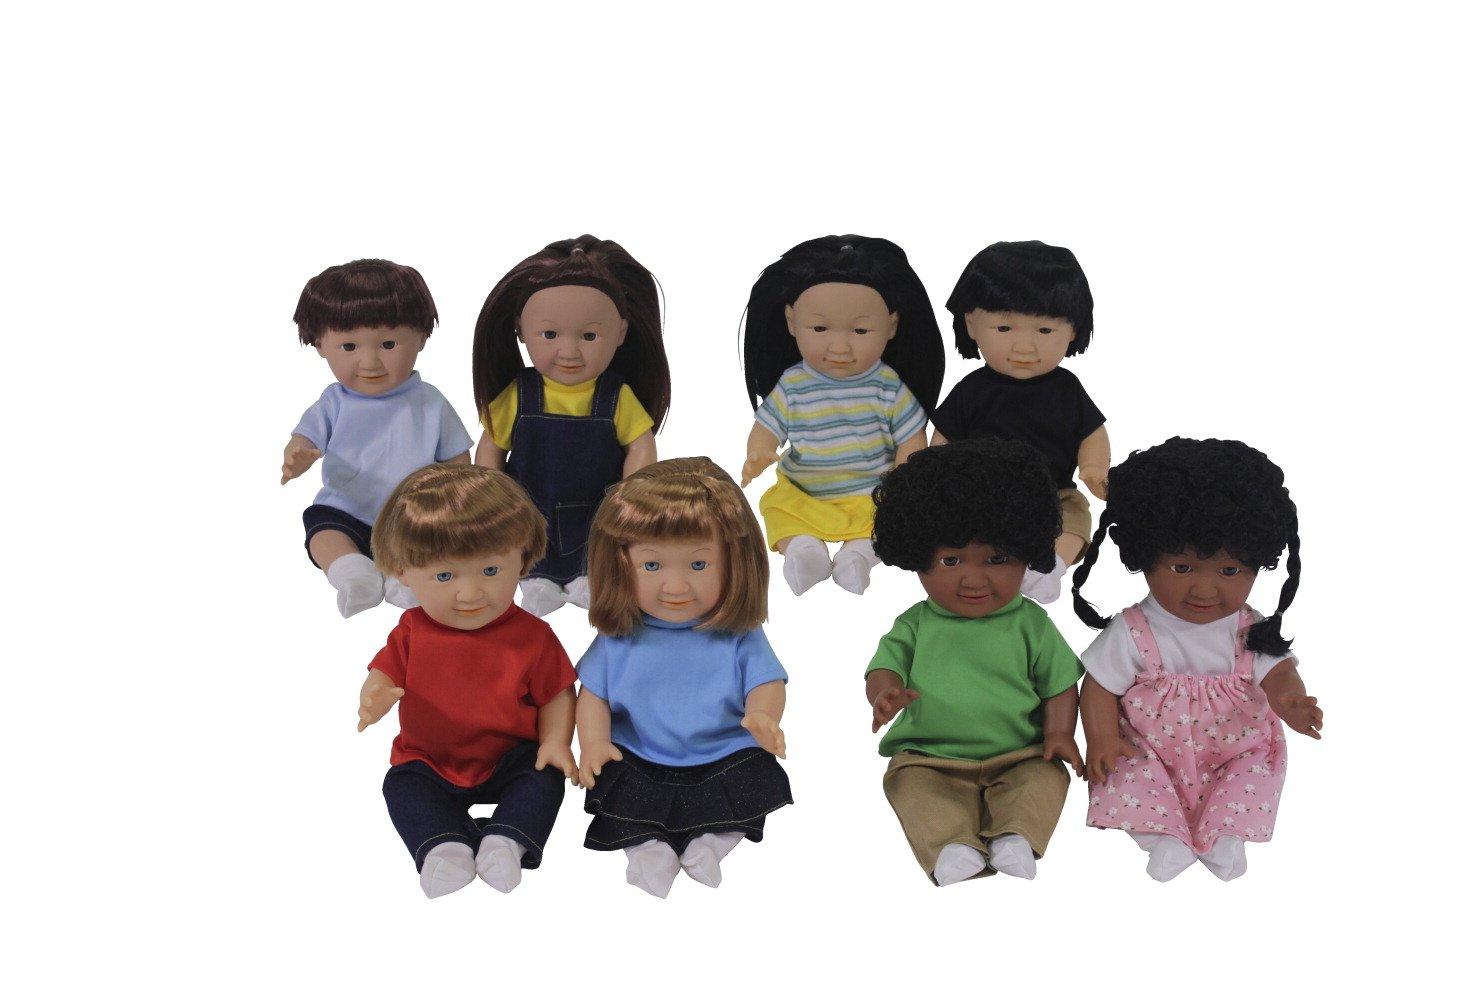 Childcraft Multi Ethnic Dolls Caucasian African American Asian and Hispanic - 13 inch - Set of 8